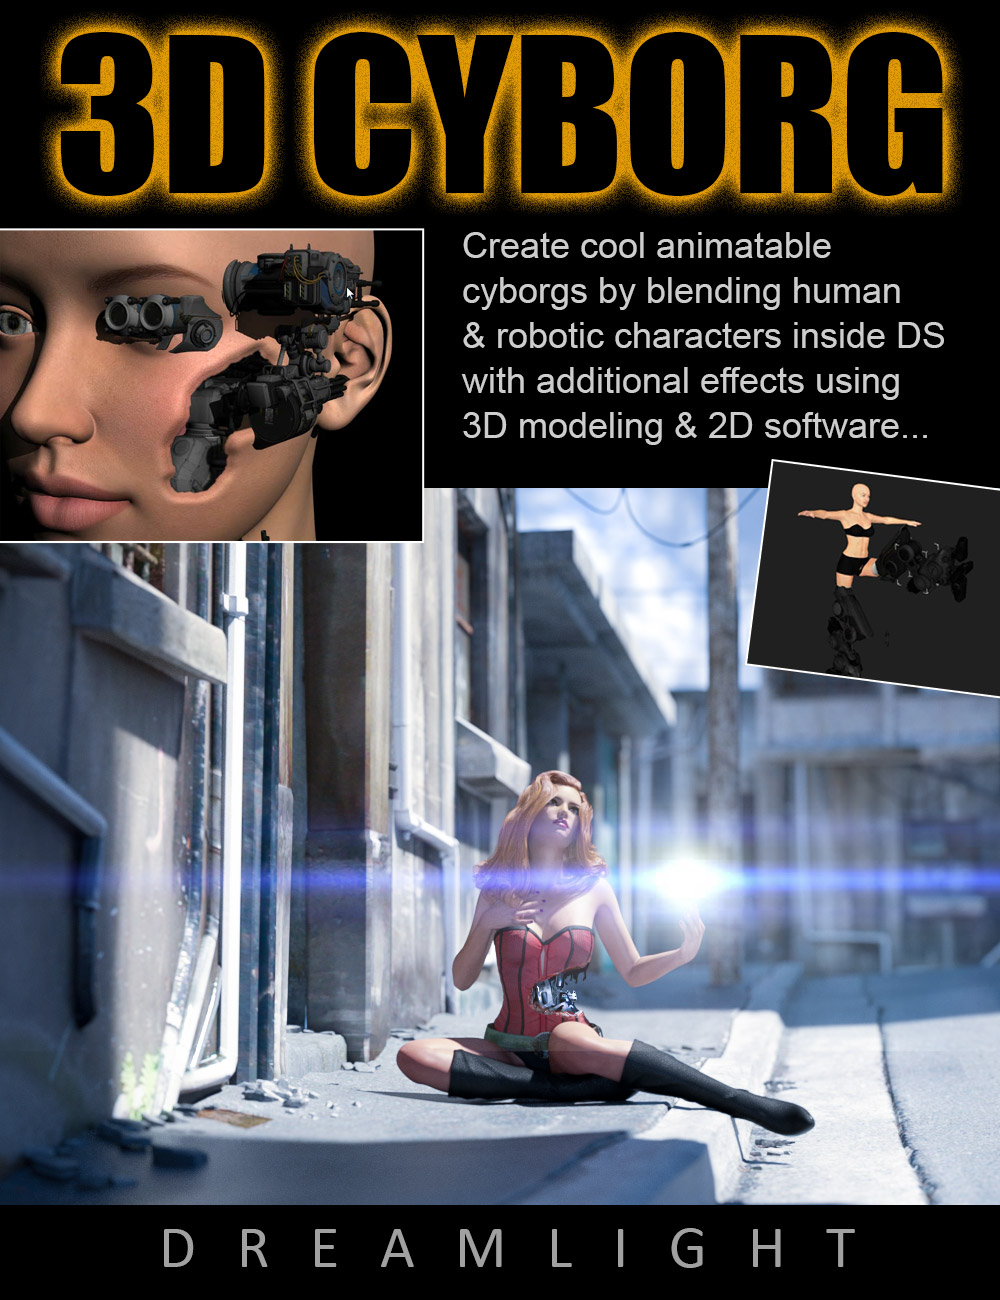 3D Cyborg Tutorial by: Dreamlight, 3D Models by Daz 3D